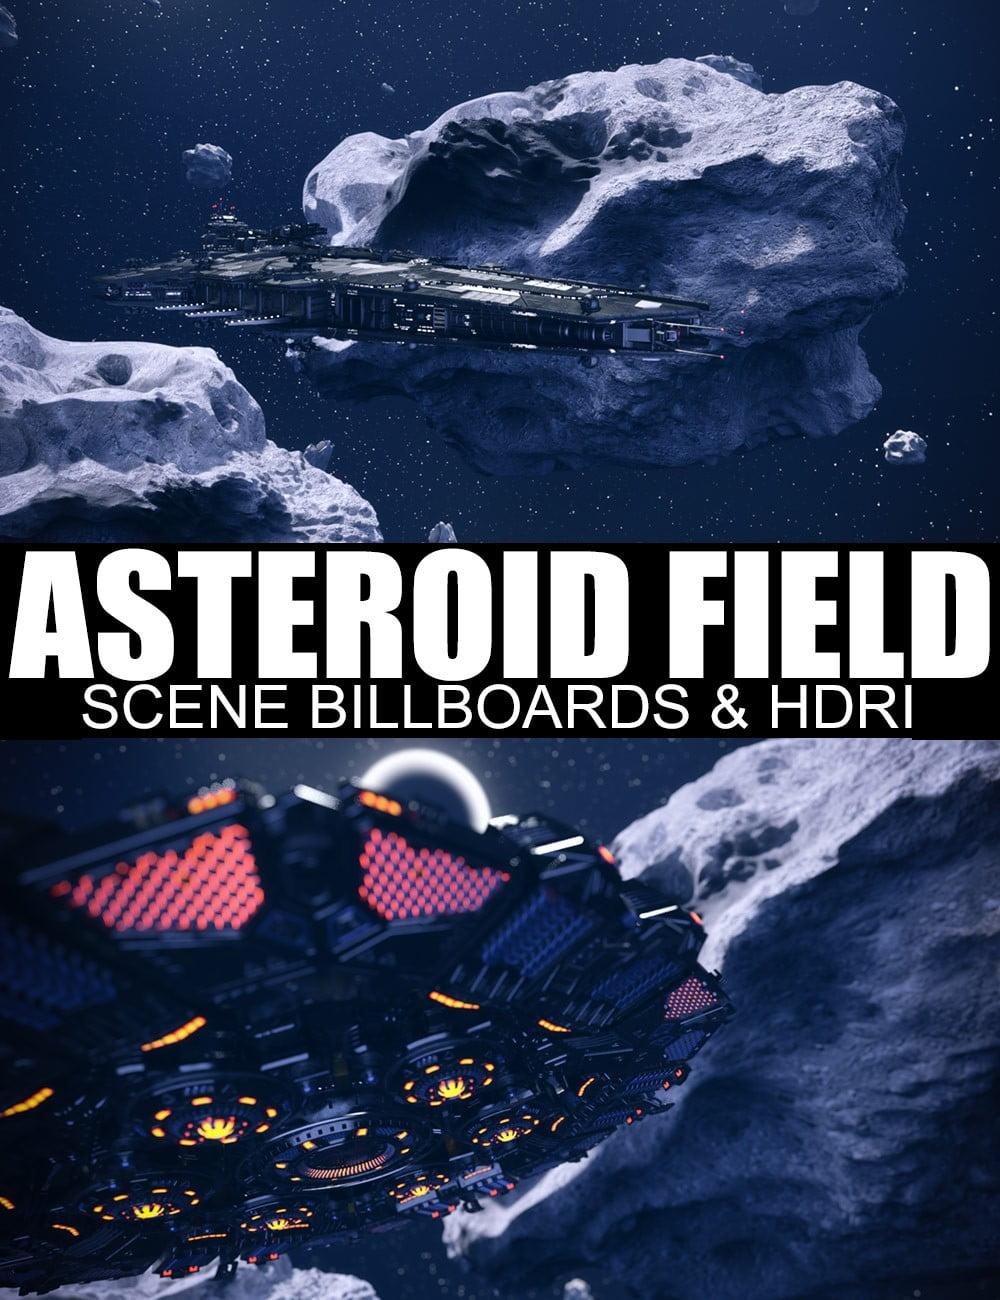 Asteroid Field Scene Billboards and HDRI